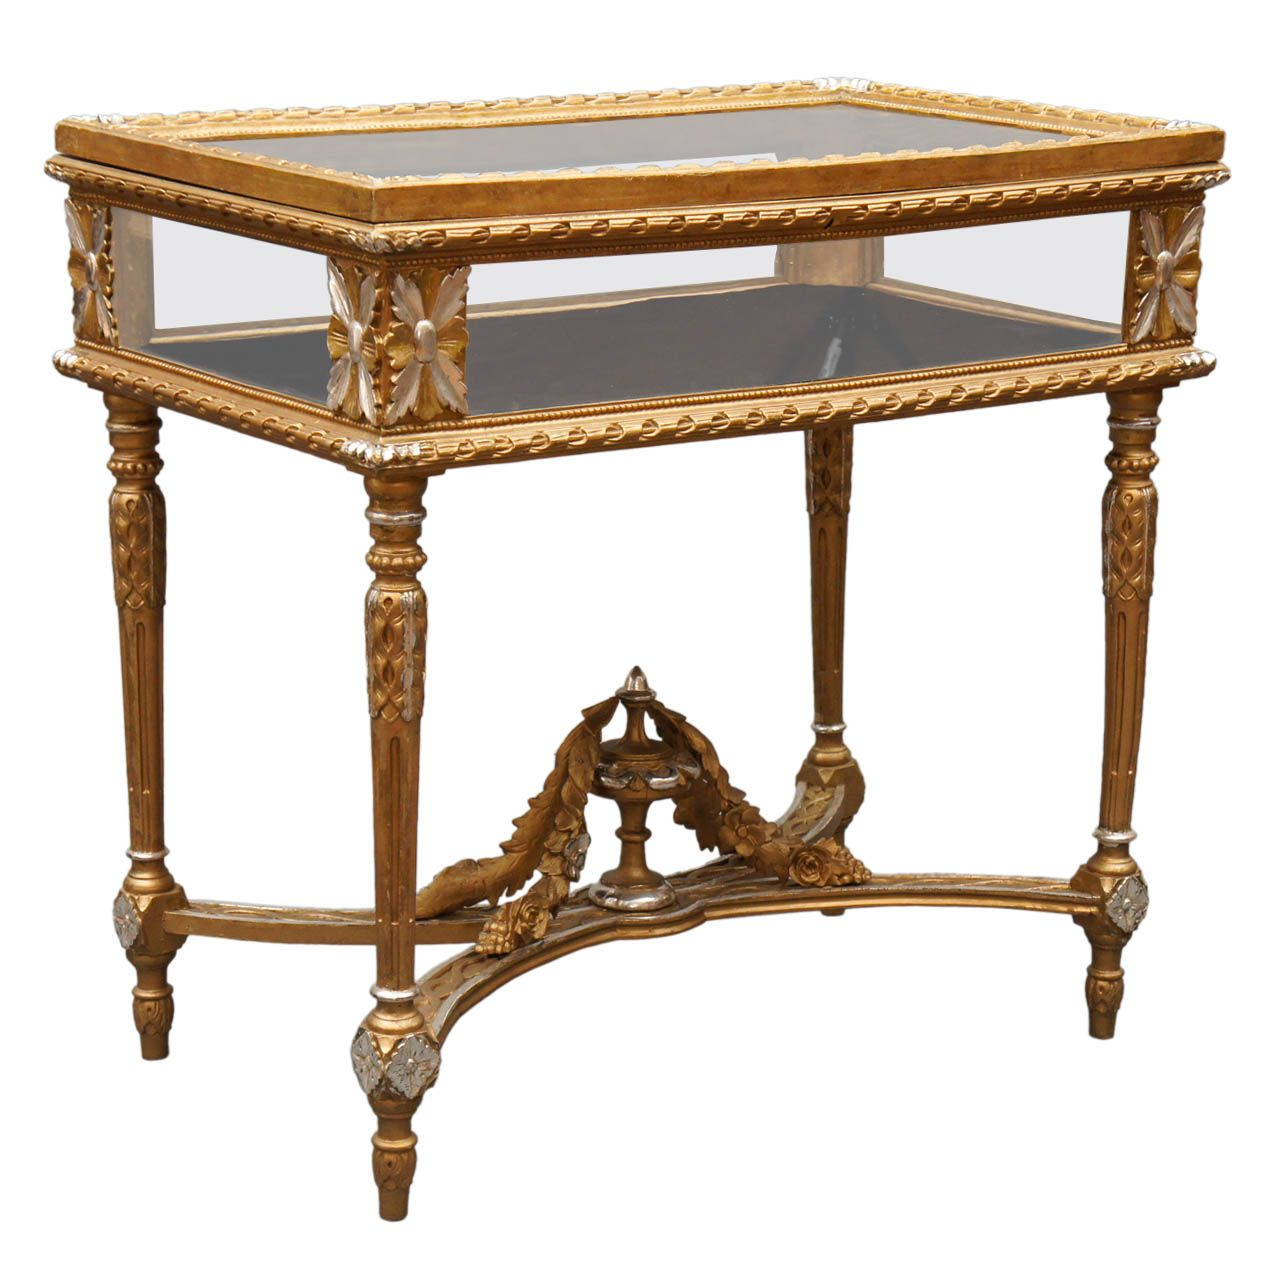 40+ 19th century antique furniture leg styles ideas in 2021